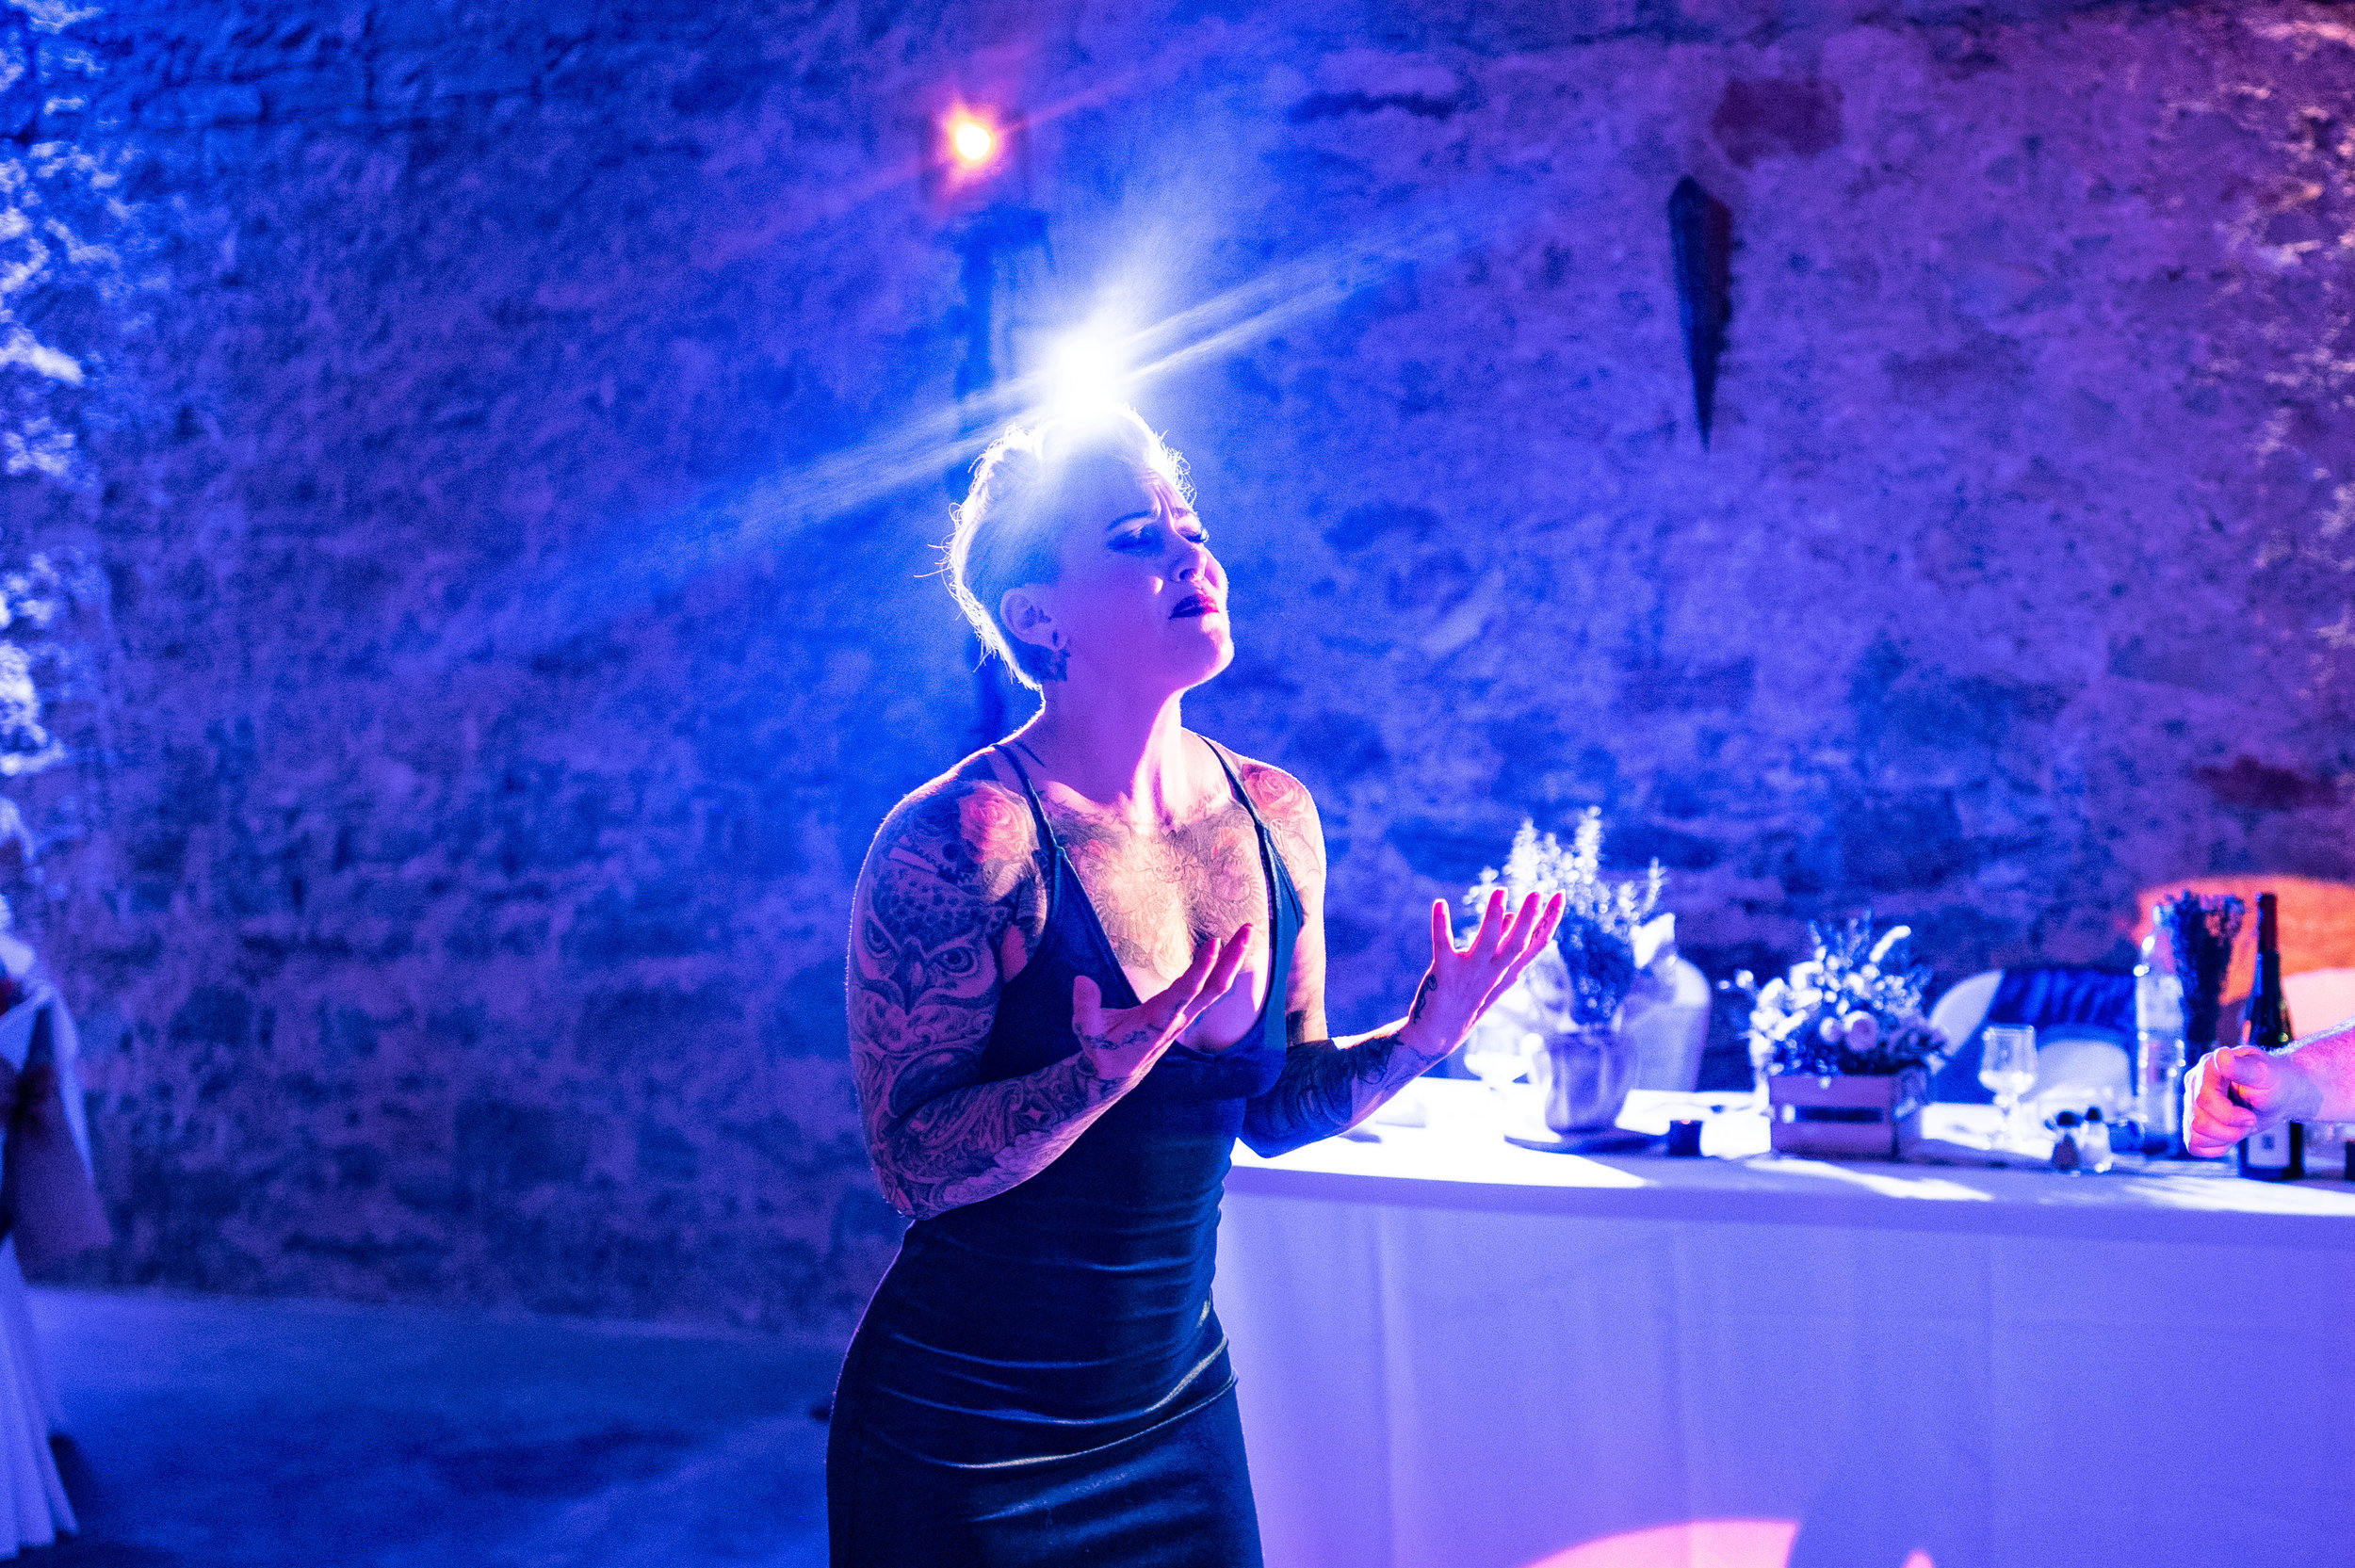 french-farmhouse-wedding-photography-carcassonne-france-904